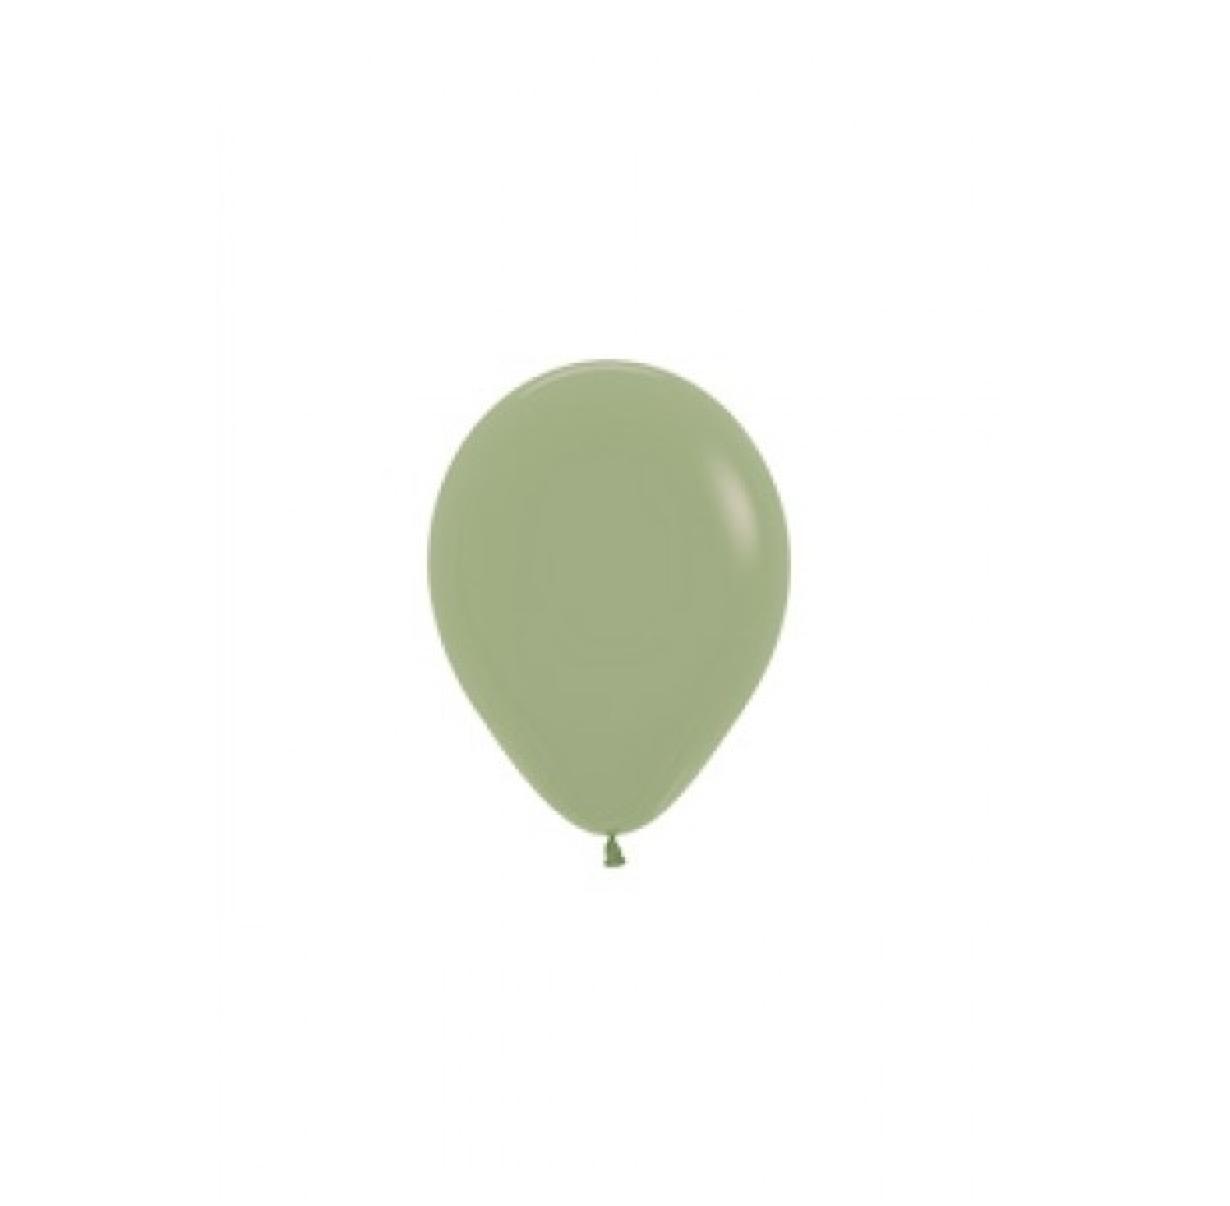 HH 10 x mini latex balloons eucalyptus 12 cm